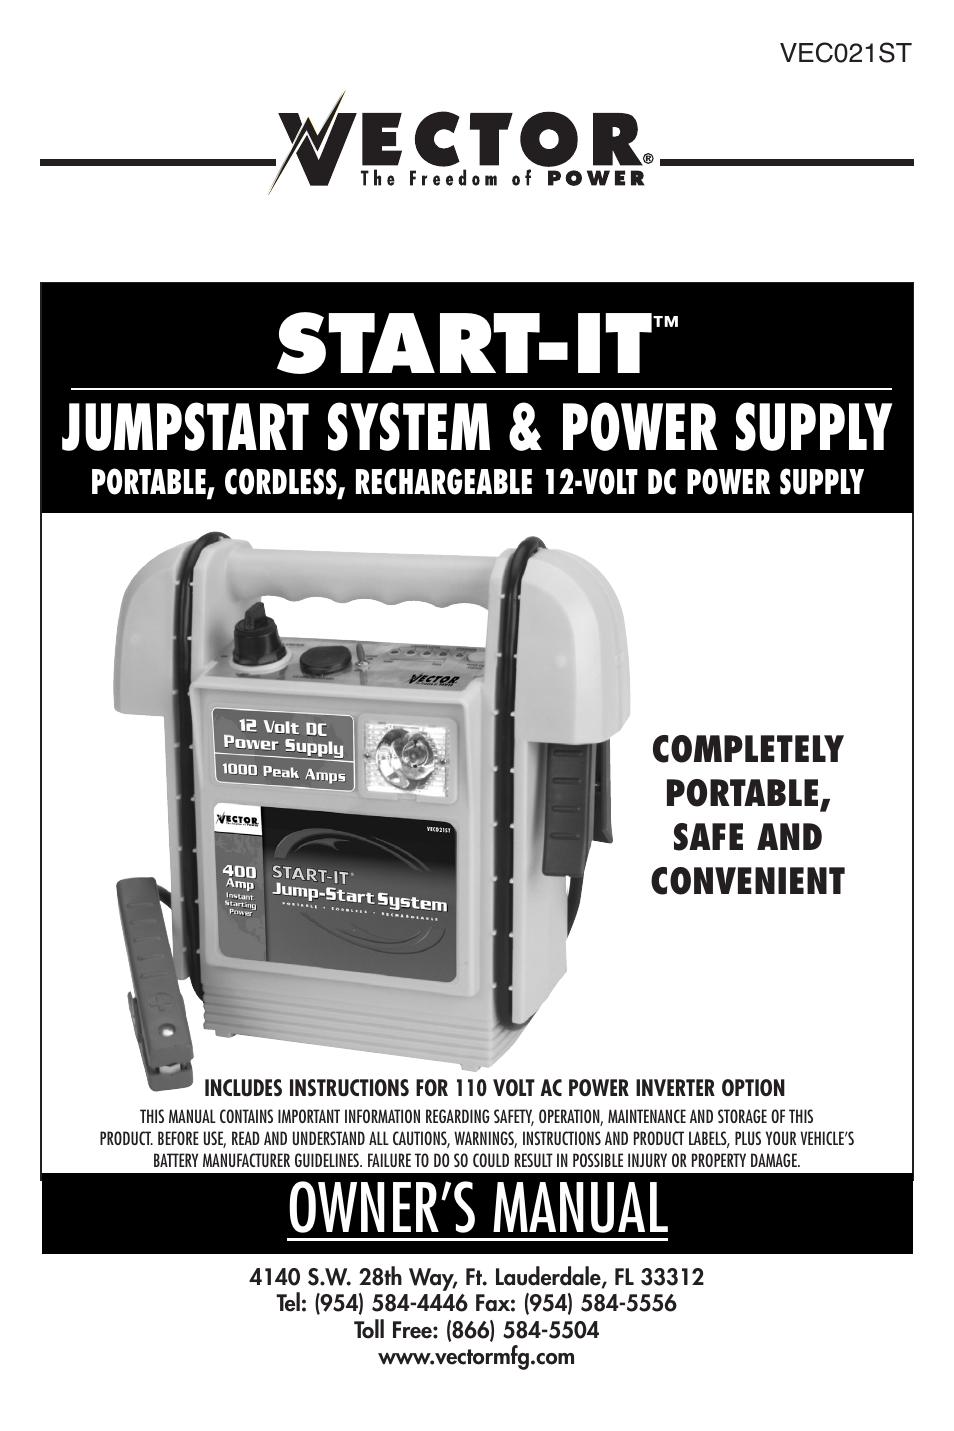 vector vec021st user manual 16 pages rh manualsdir com Vector Jump Starter Parts for Vector Jump Starter veco10s